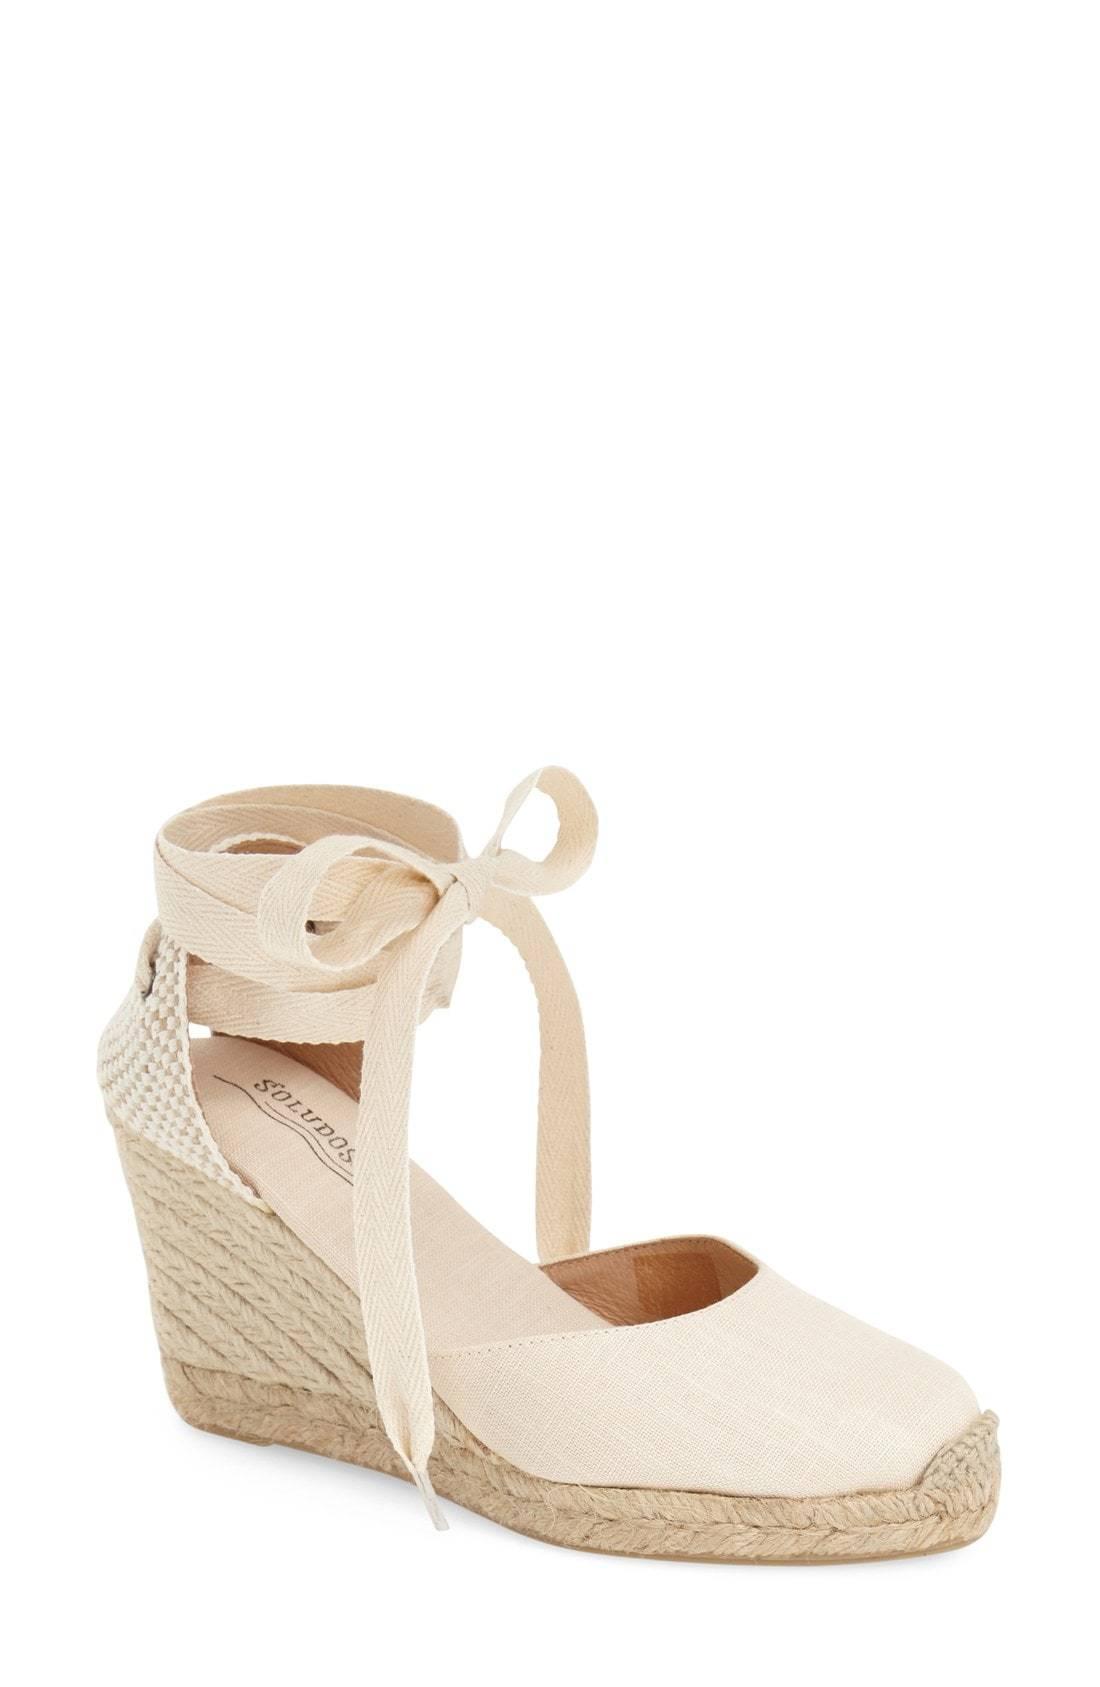 3c3203bb633 Wedge Lace Up Espadrille Sandal